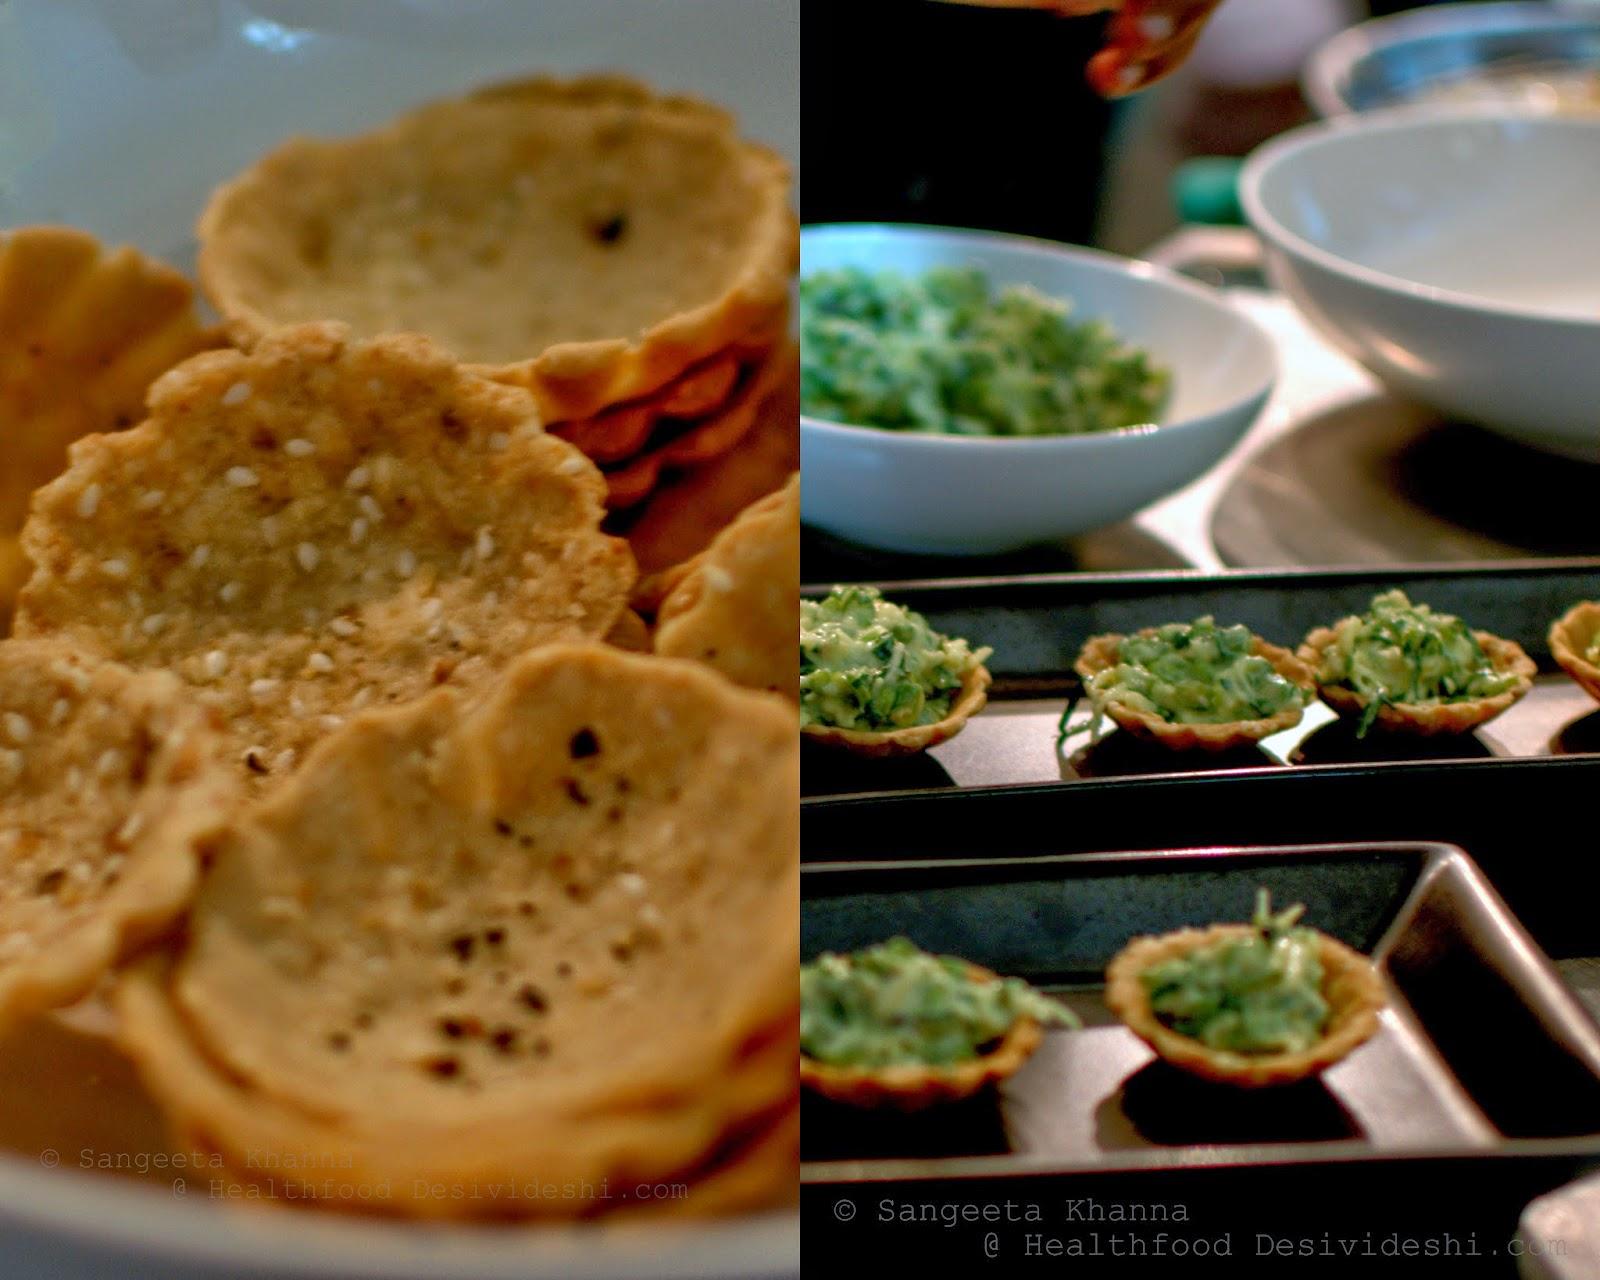 gluten free tart shells with broccoli coconut salad